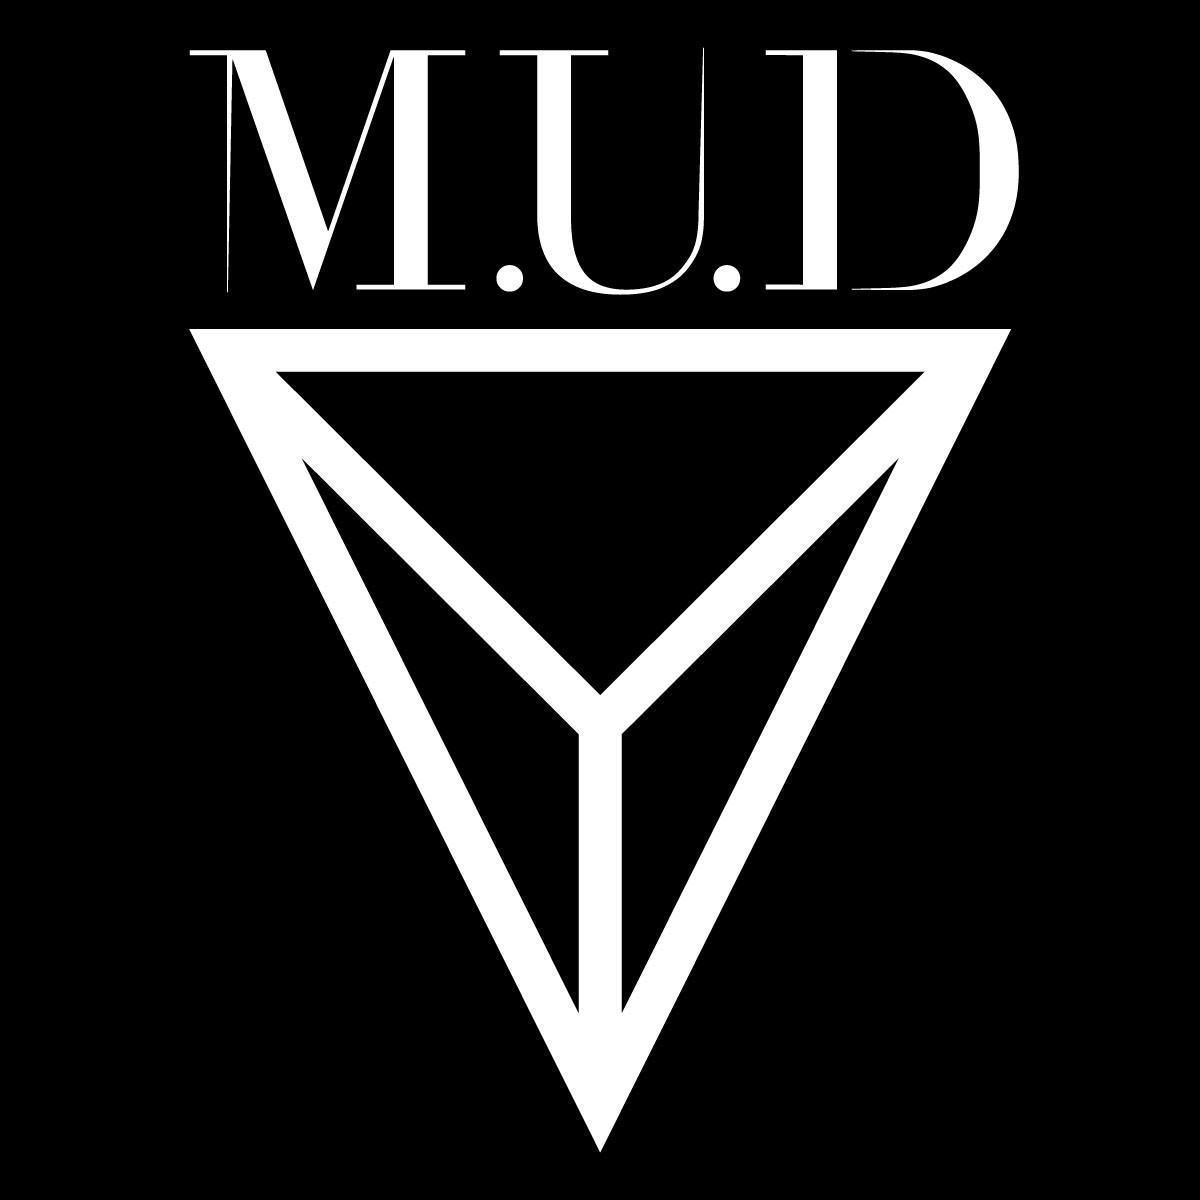 MUD Heavy Dubstep Track [Artificial Intelligence] Walkthrough By Ammon-Ra